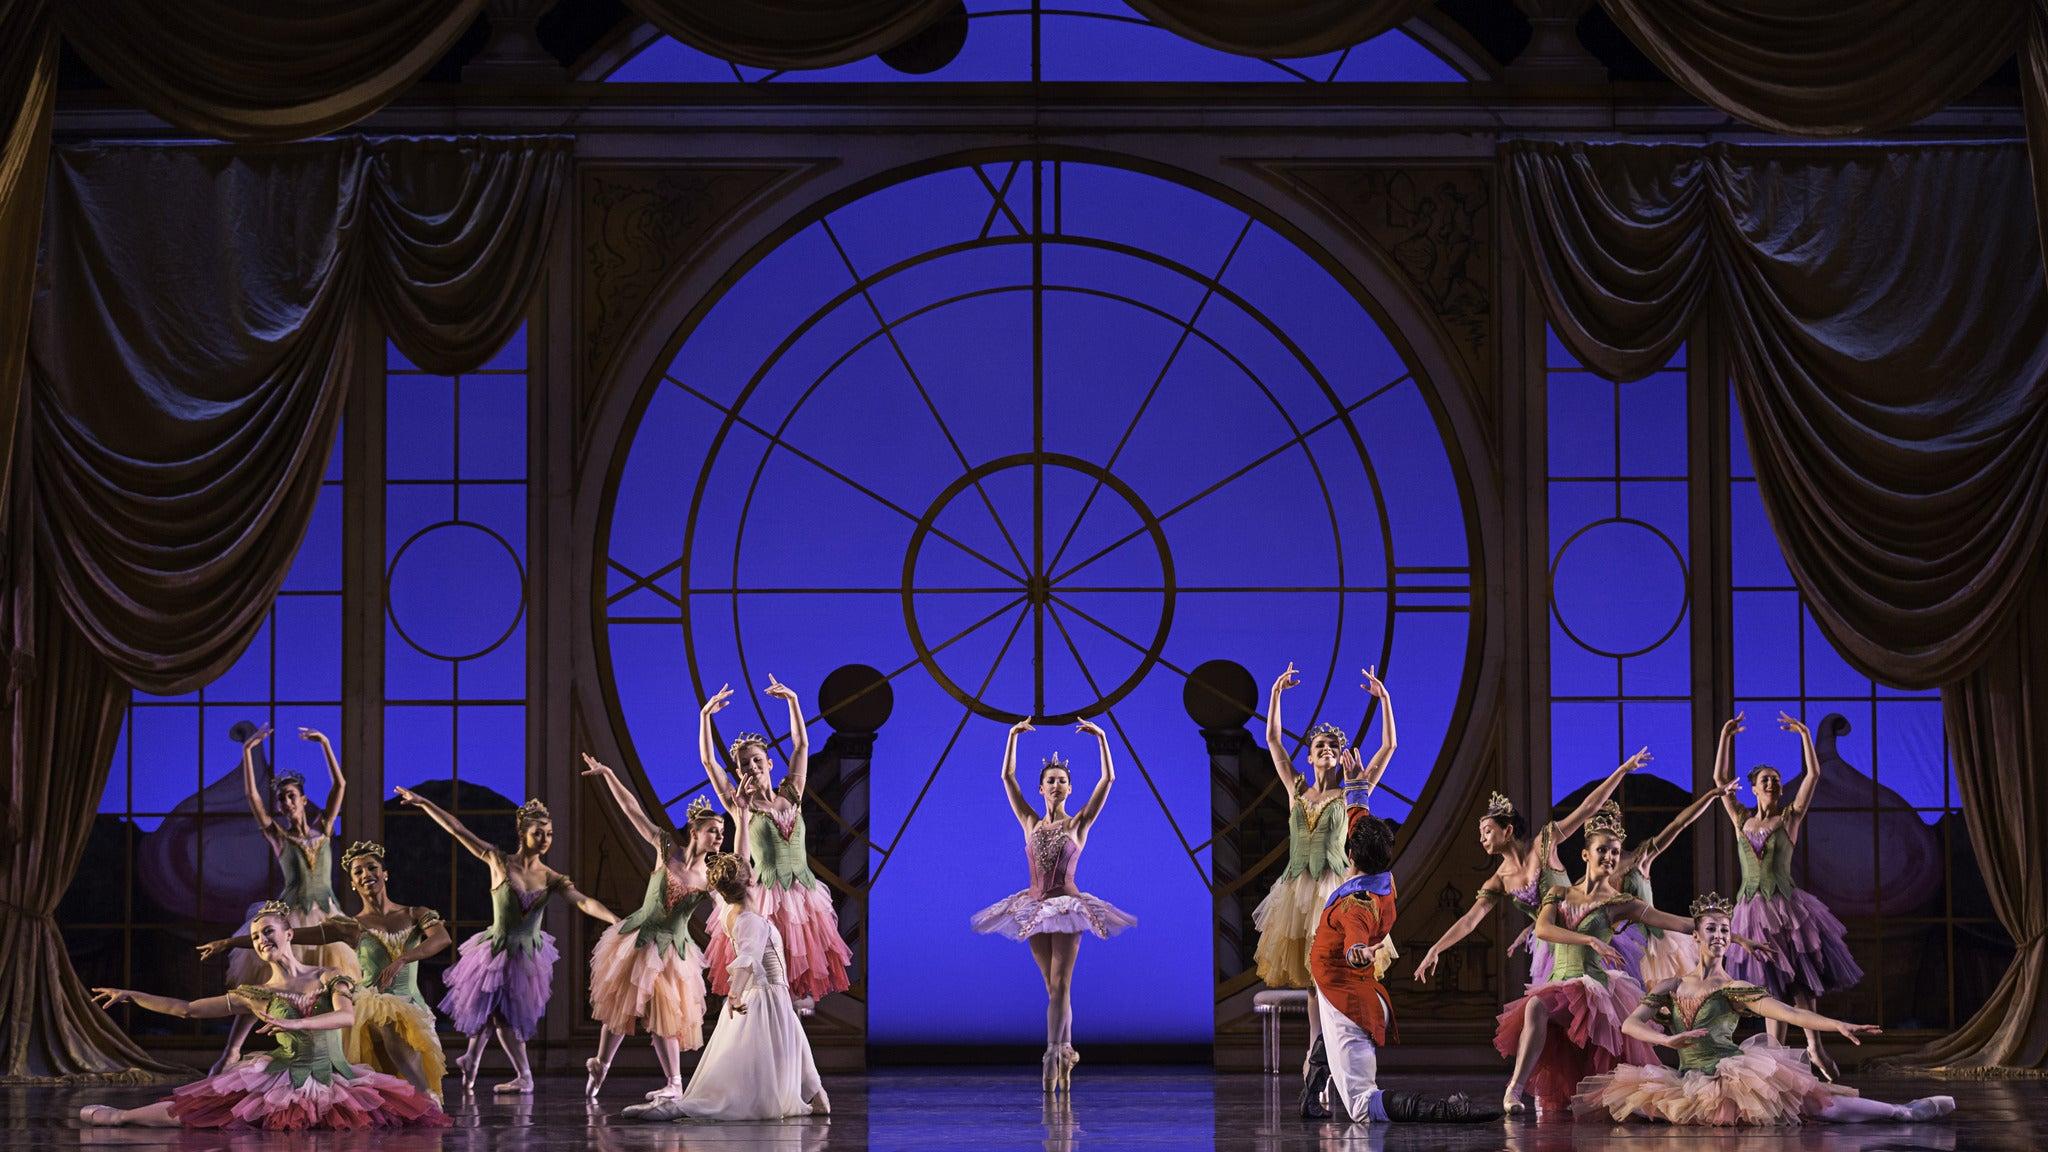 BalletMet Presents The Nutcracker at Ohio Theatre